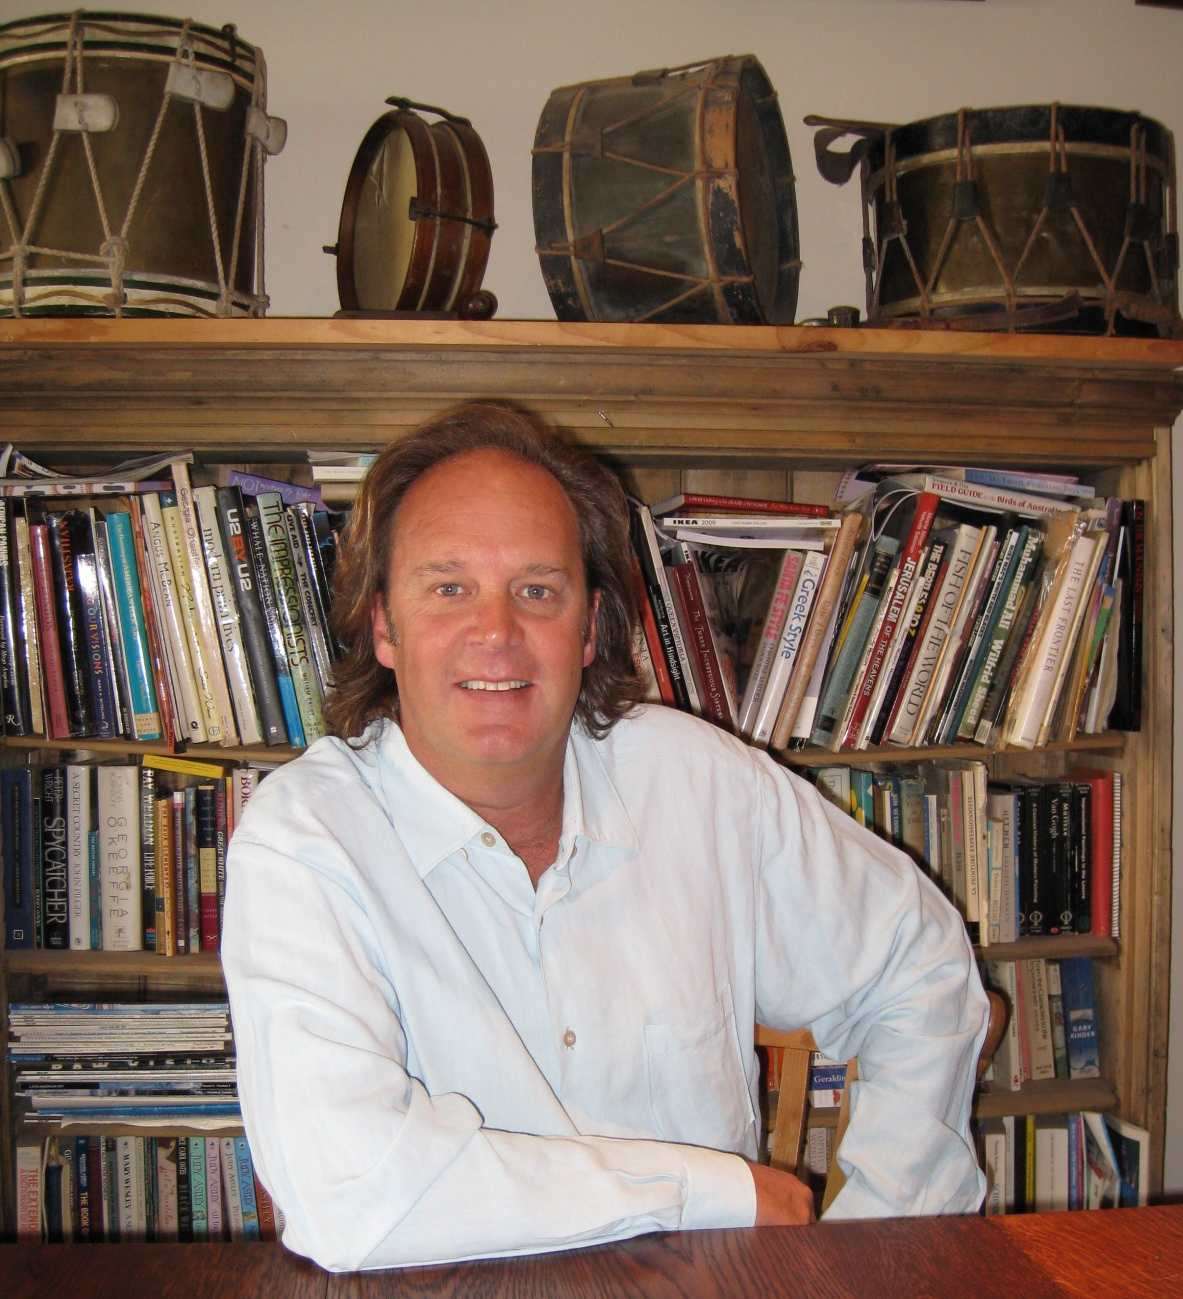 Mark Greenwood (Photo by Frane Lessac)